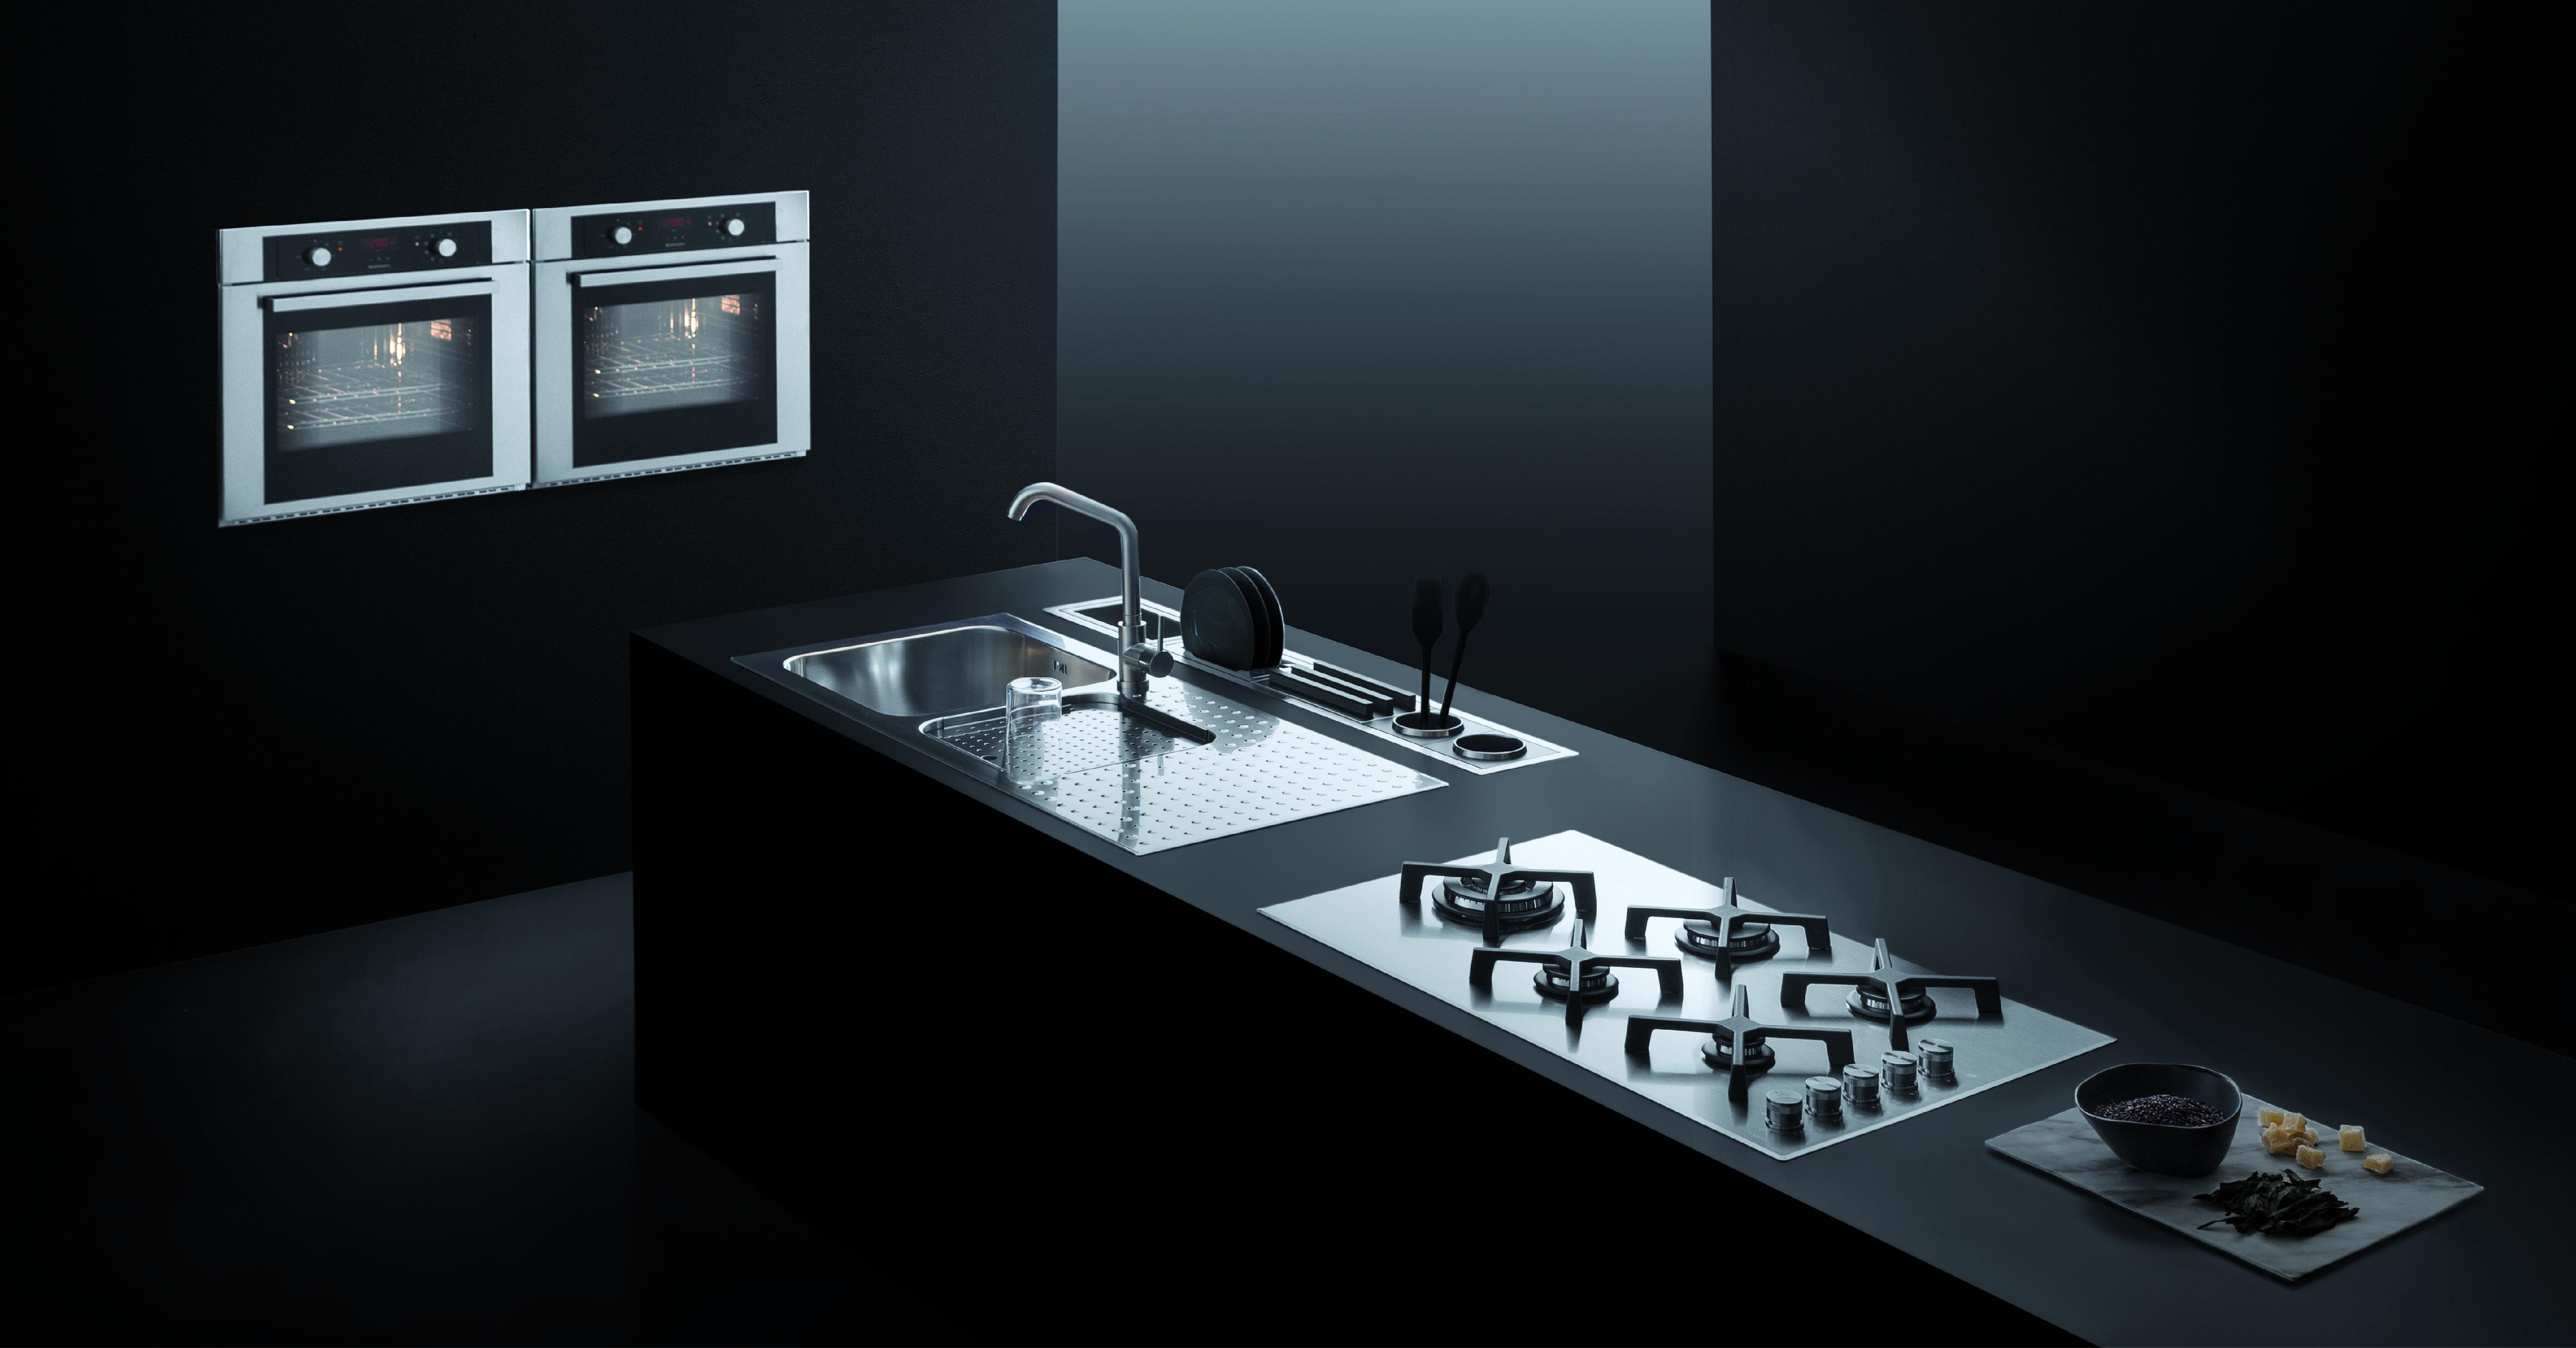 Professional Advanced Milk Pasteurizer For Top Quanlity ...  |Advanced Kitchen Appliances